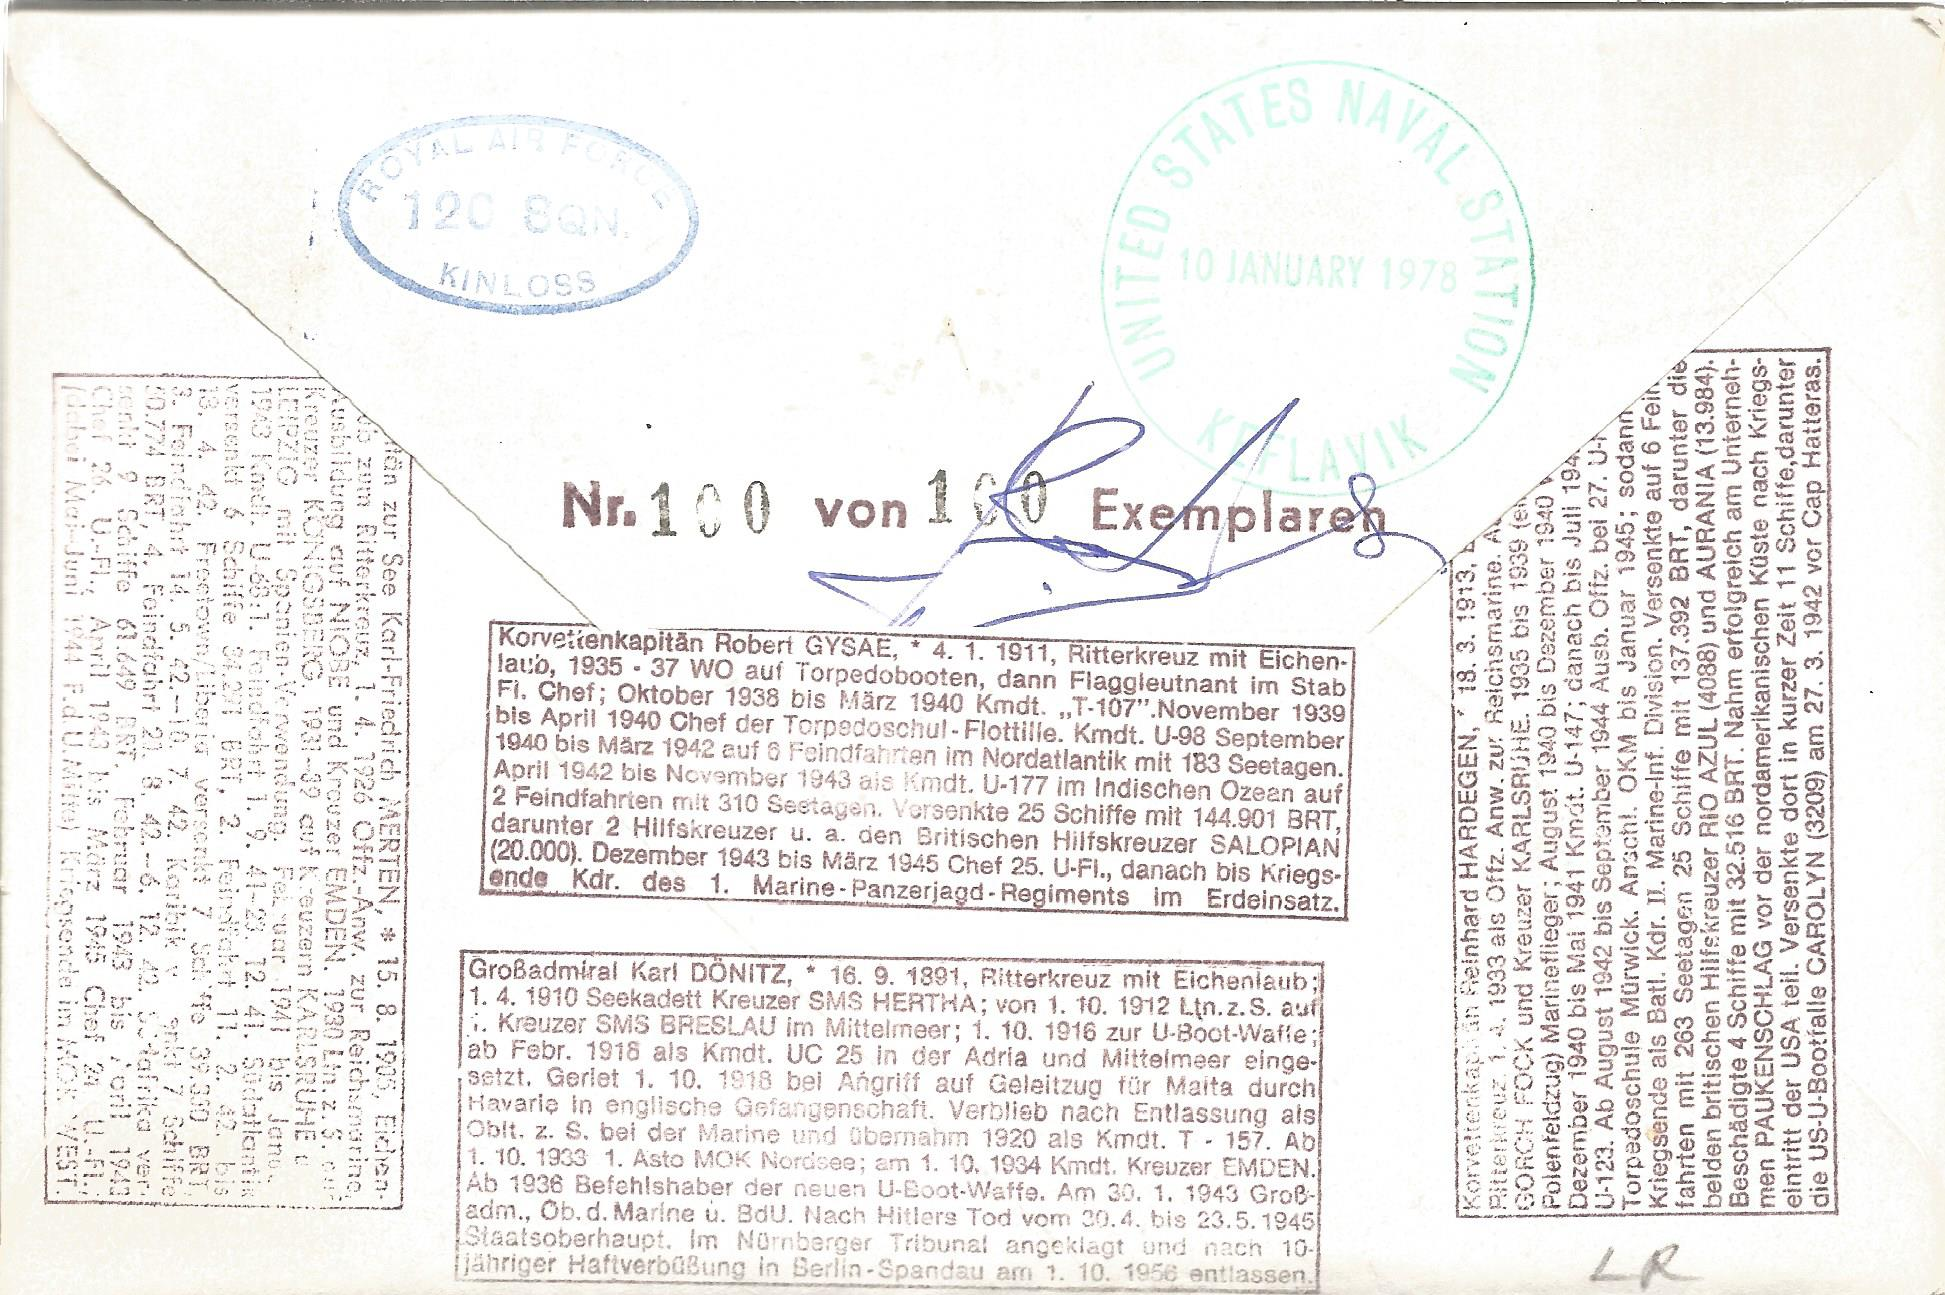 Robert Gysae, Karl Friedrich Merten, Reinhard Hardegen and Karl Donitz signed Sqn Ldr T. M. - Image 2 of 2